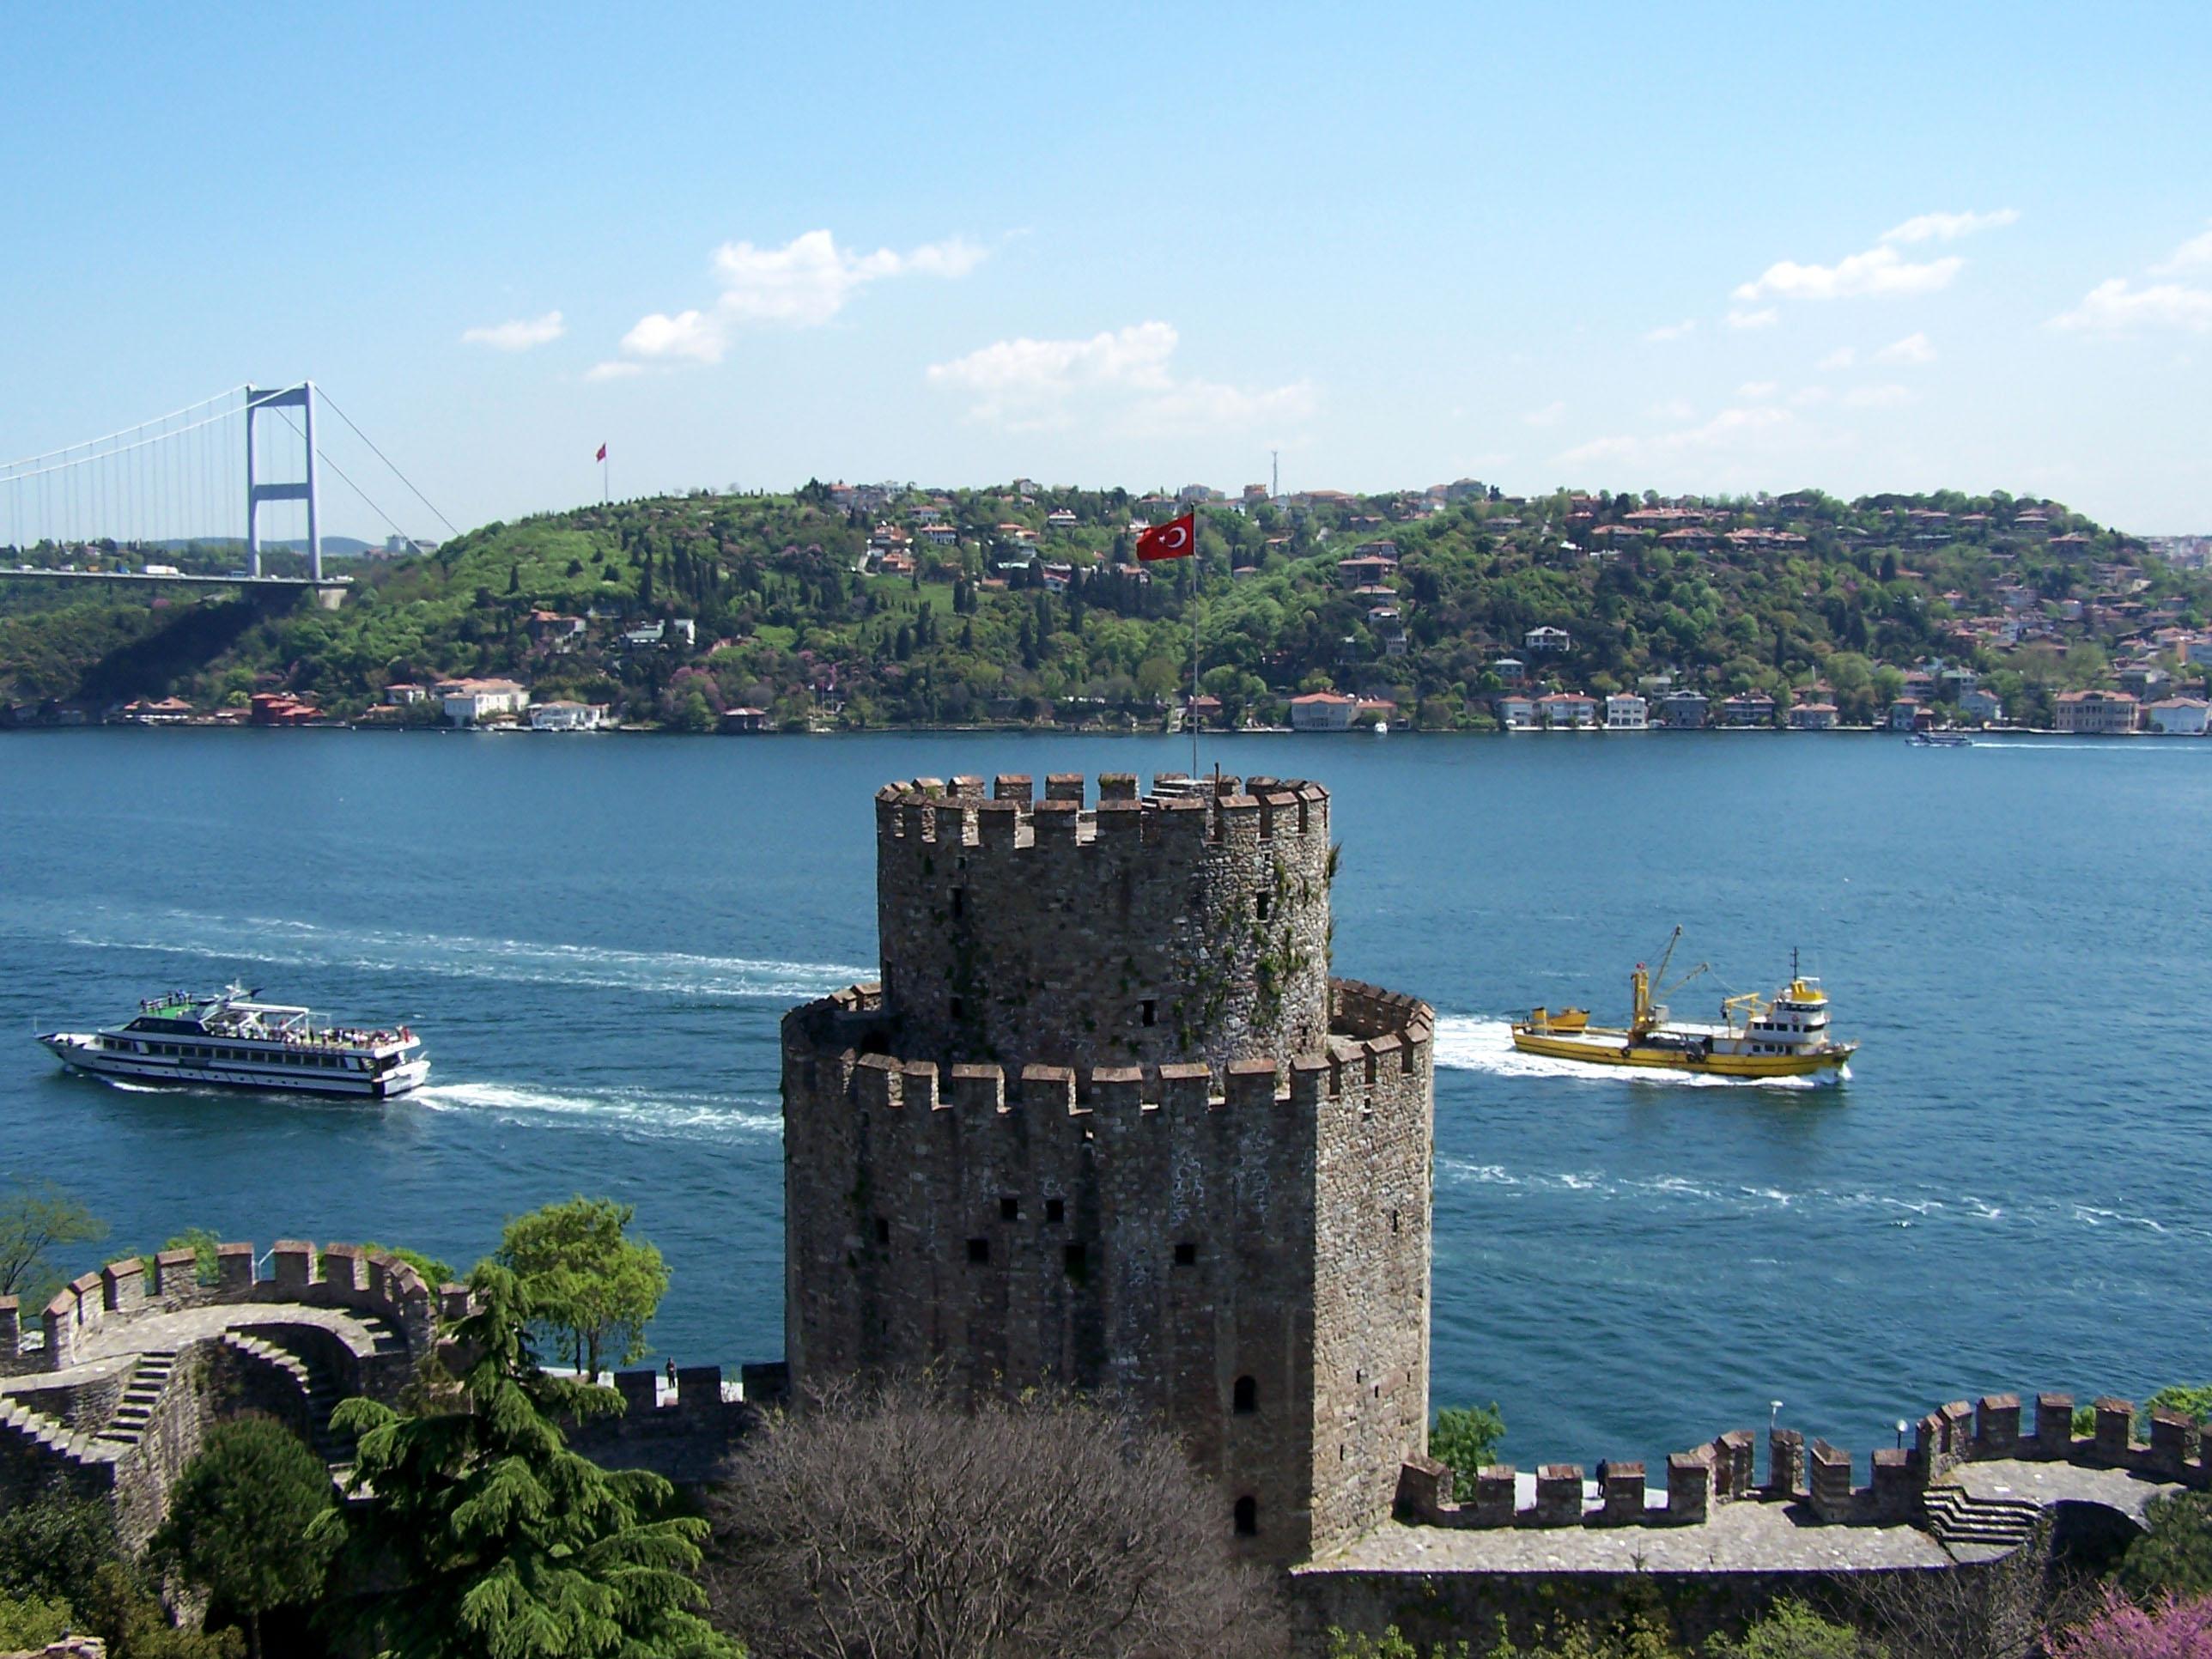 File:İstanbul 5678.jpg - Wikimedia Commons